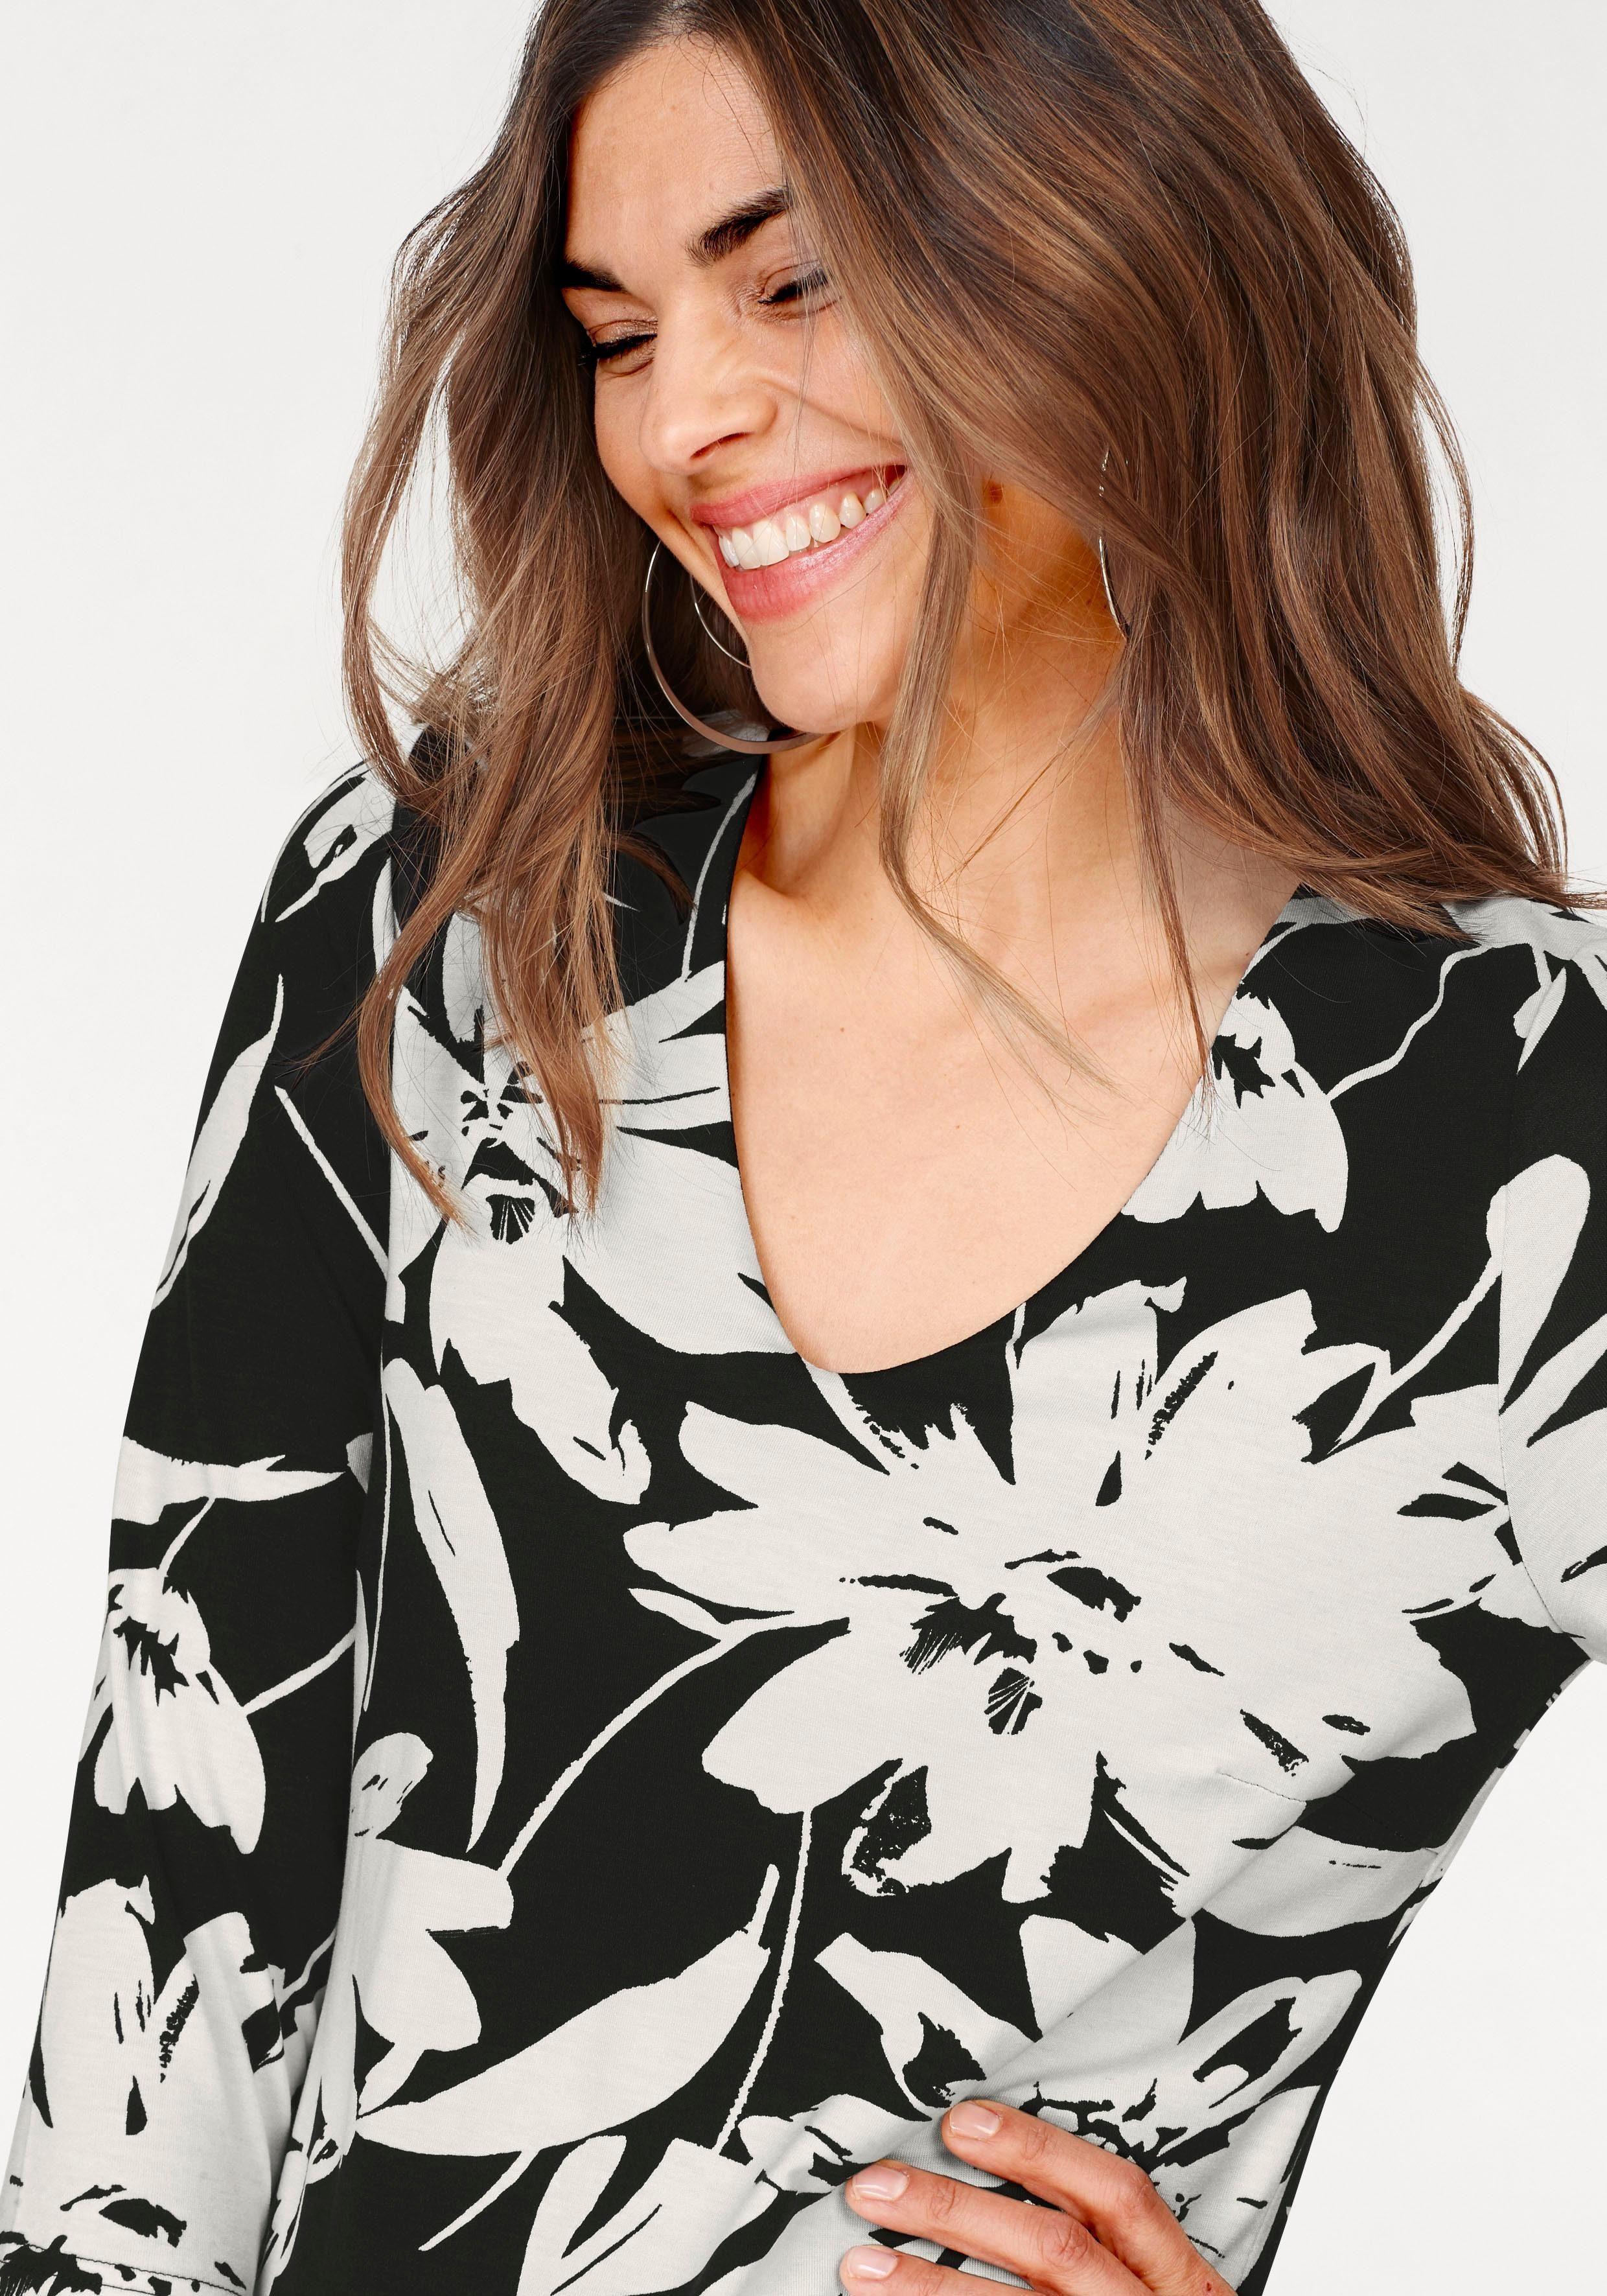 Online Bodyright Online Bodyright Kaufen Jerseykleid Online Jerseykleid Kaufen »shaping« Jerseykleid »shaping« Bodyright »shaping« PkOZiXu